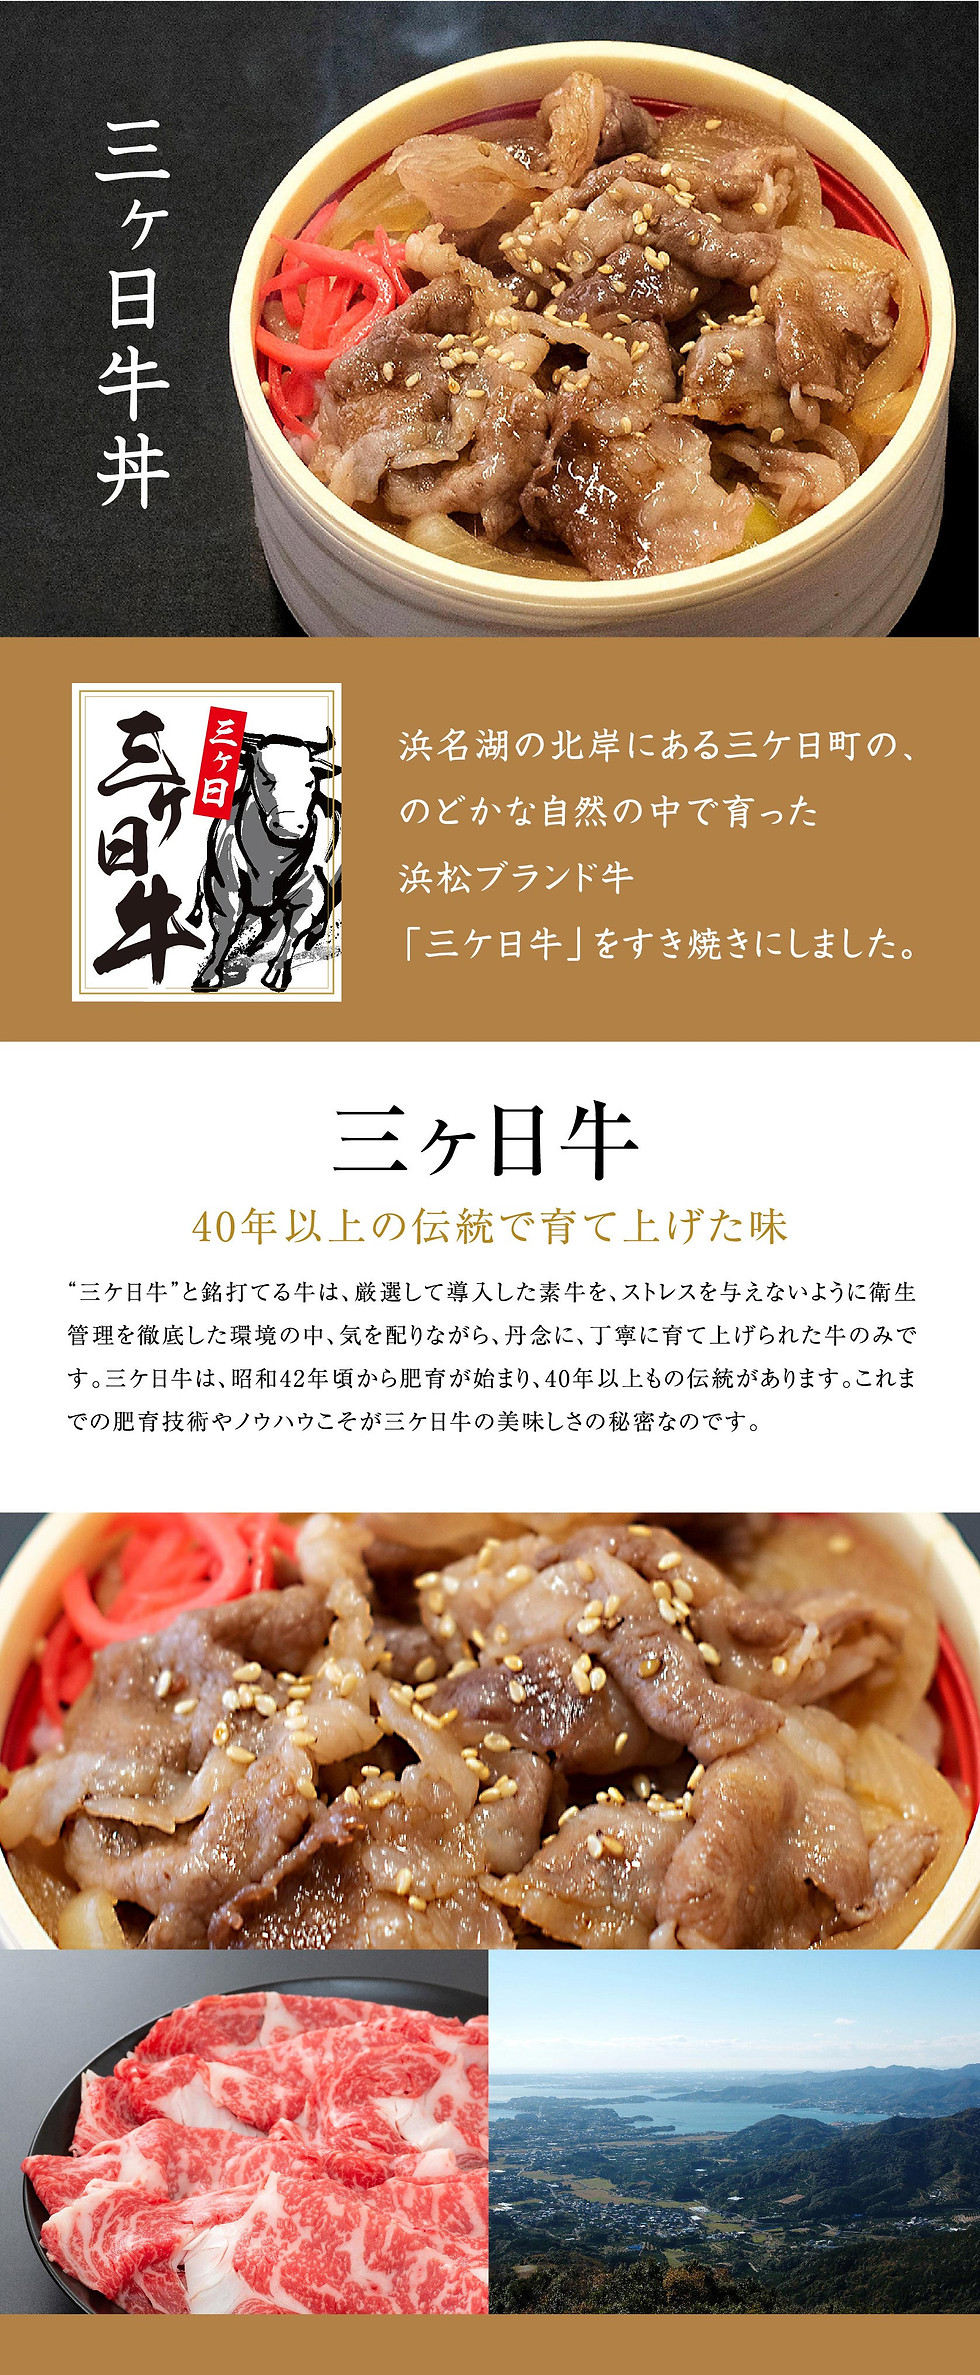 sizuokamatsuri-lp04.jpg